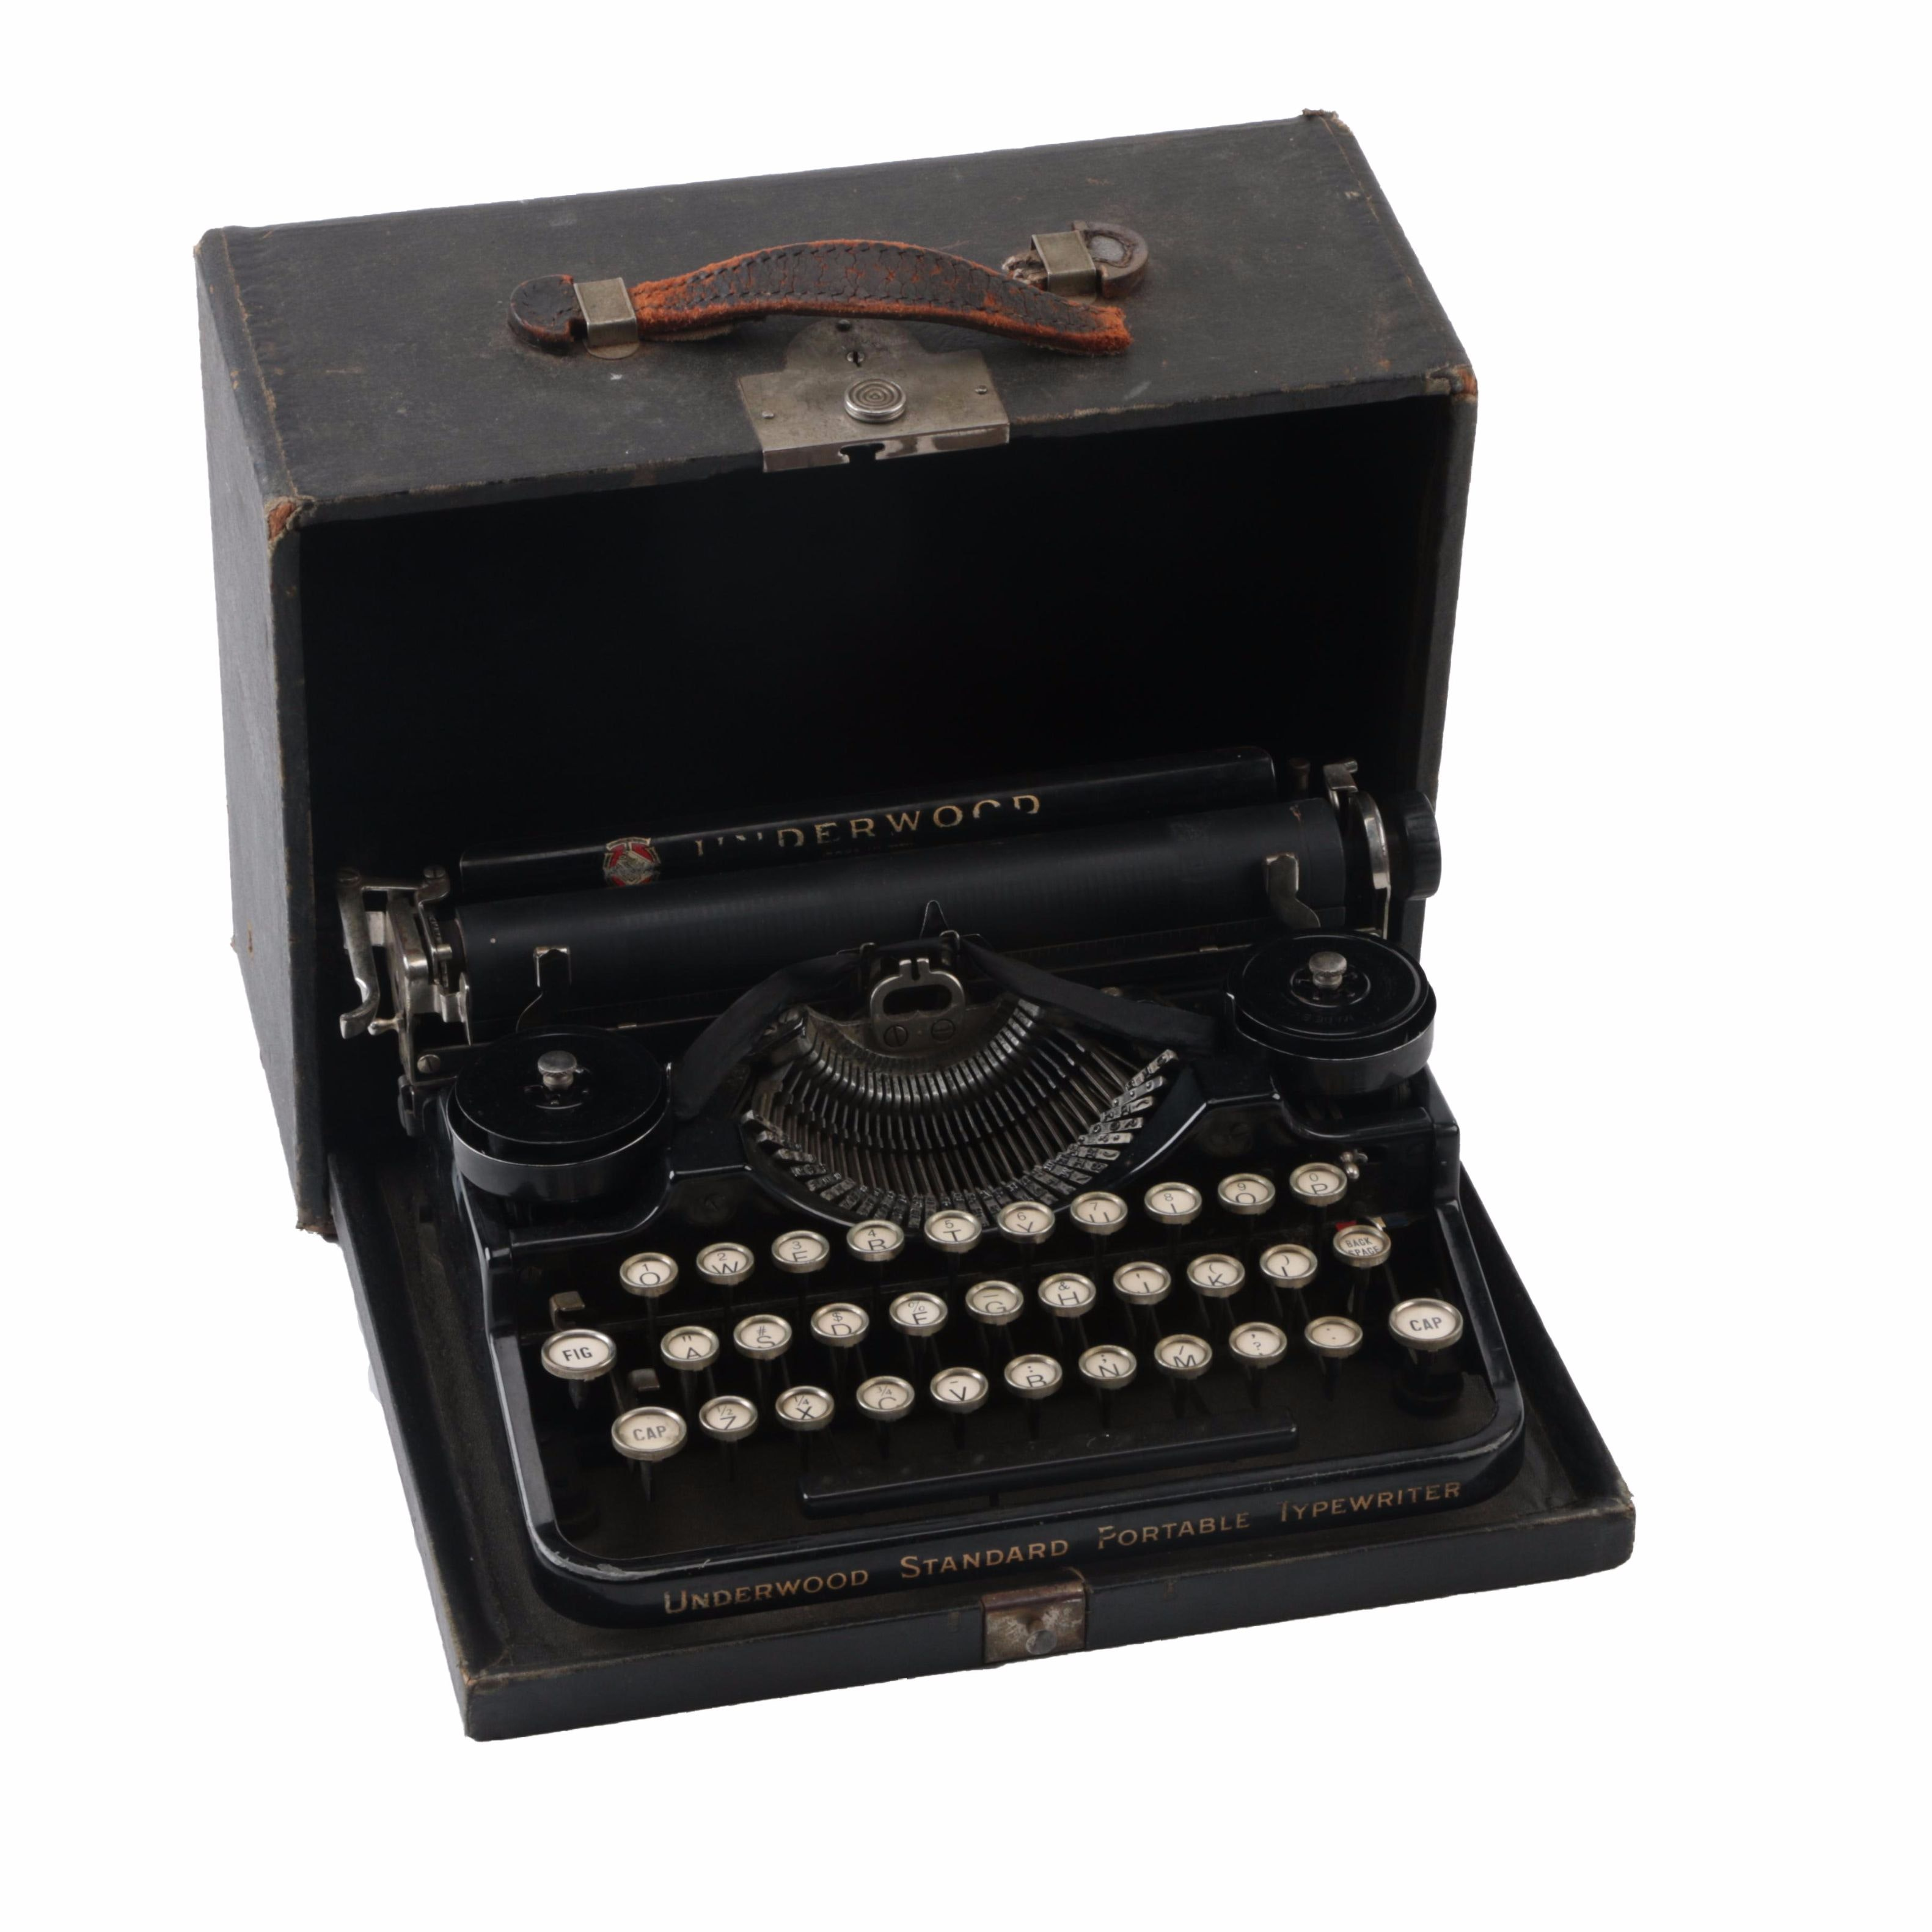 Vintage Underwood Standard Portable Typewriter